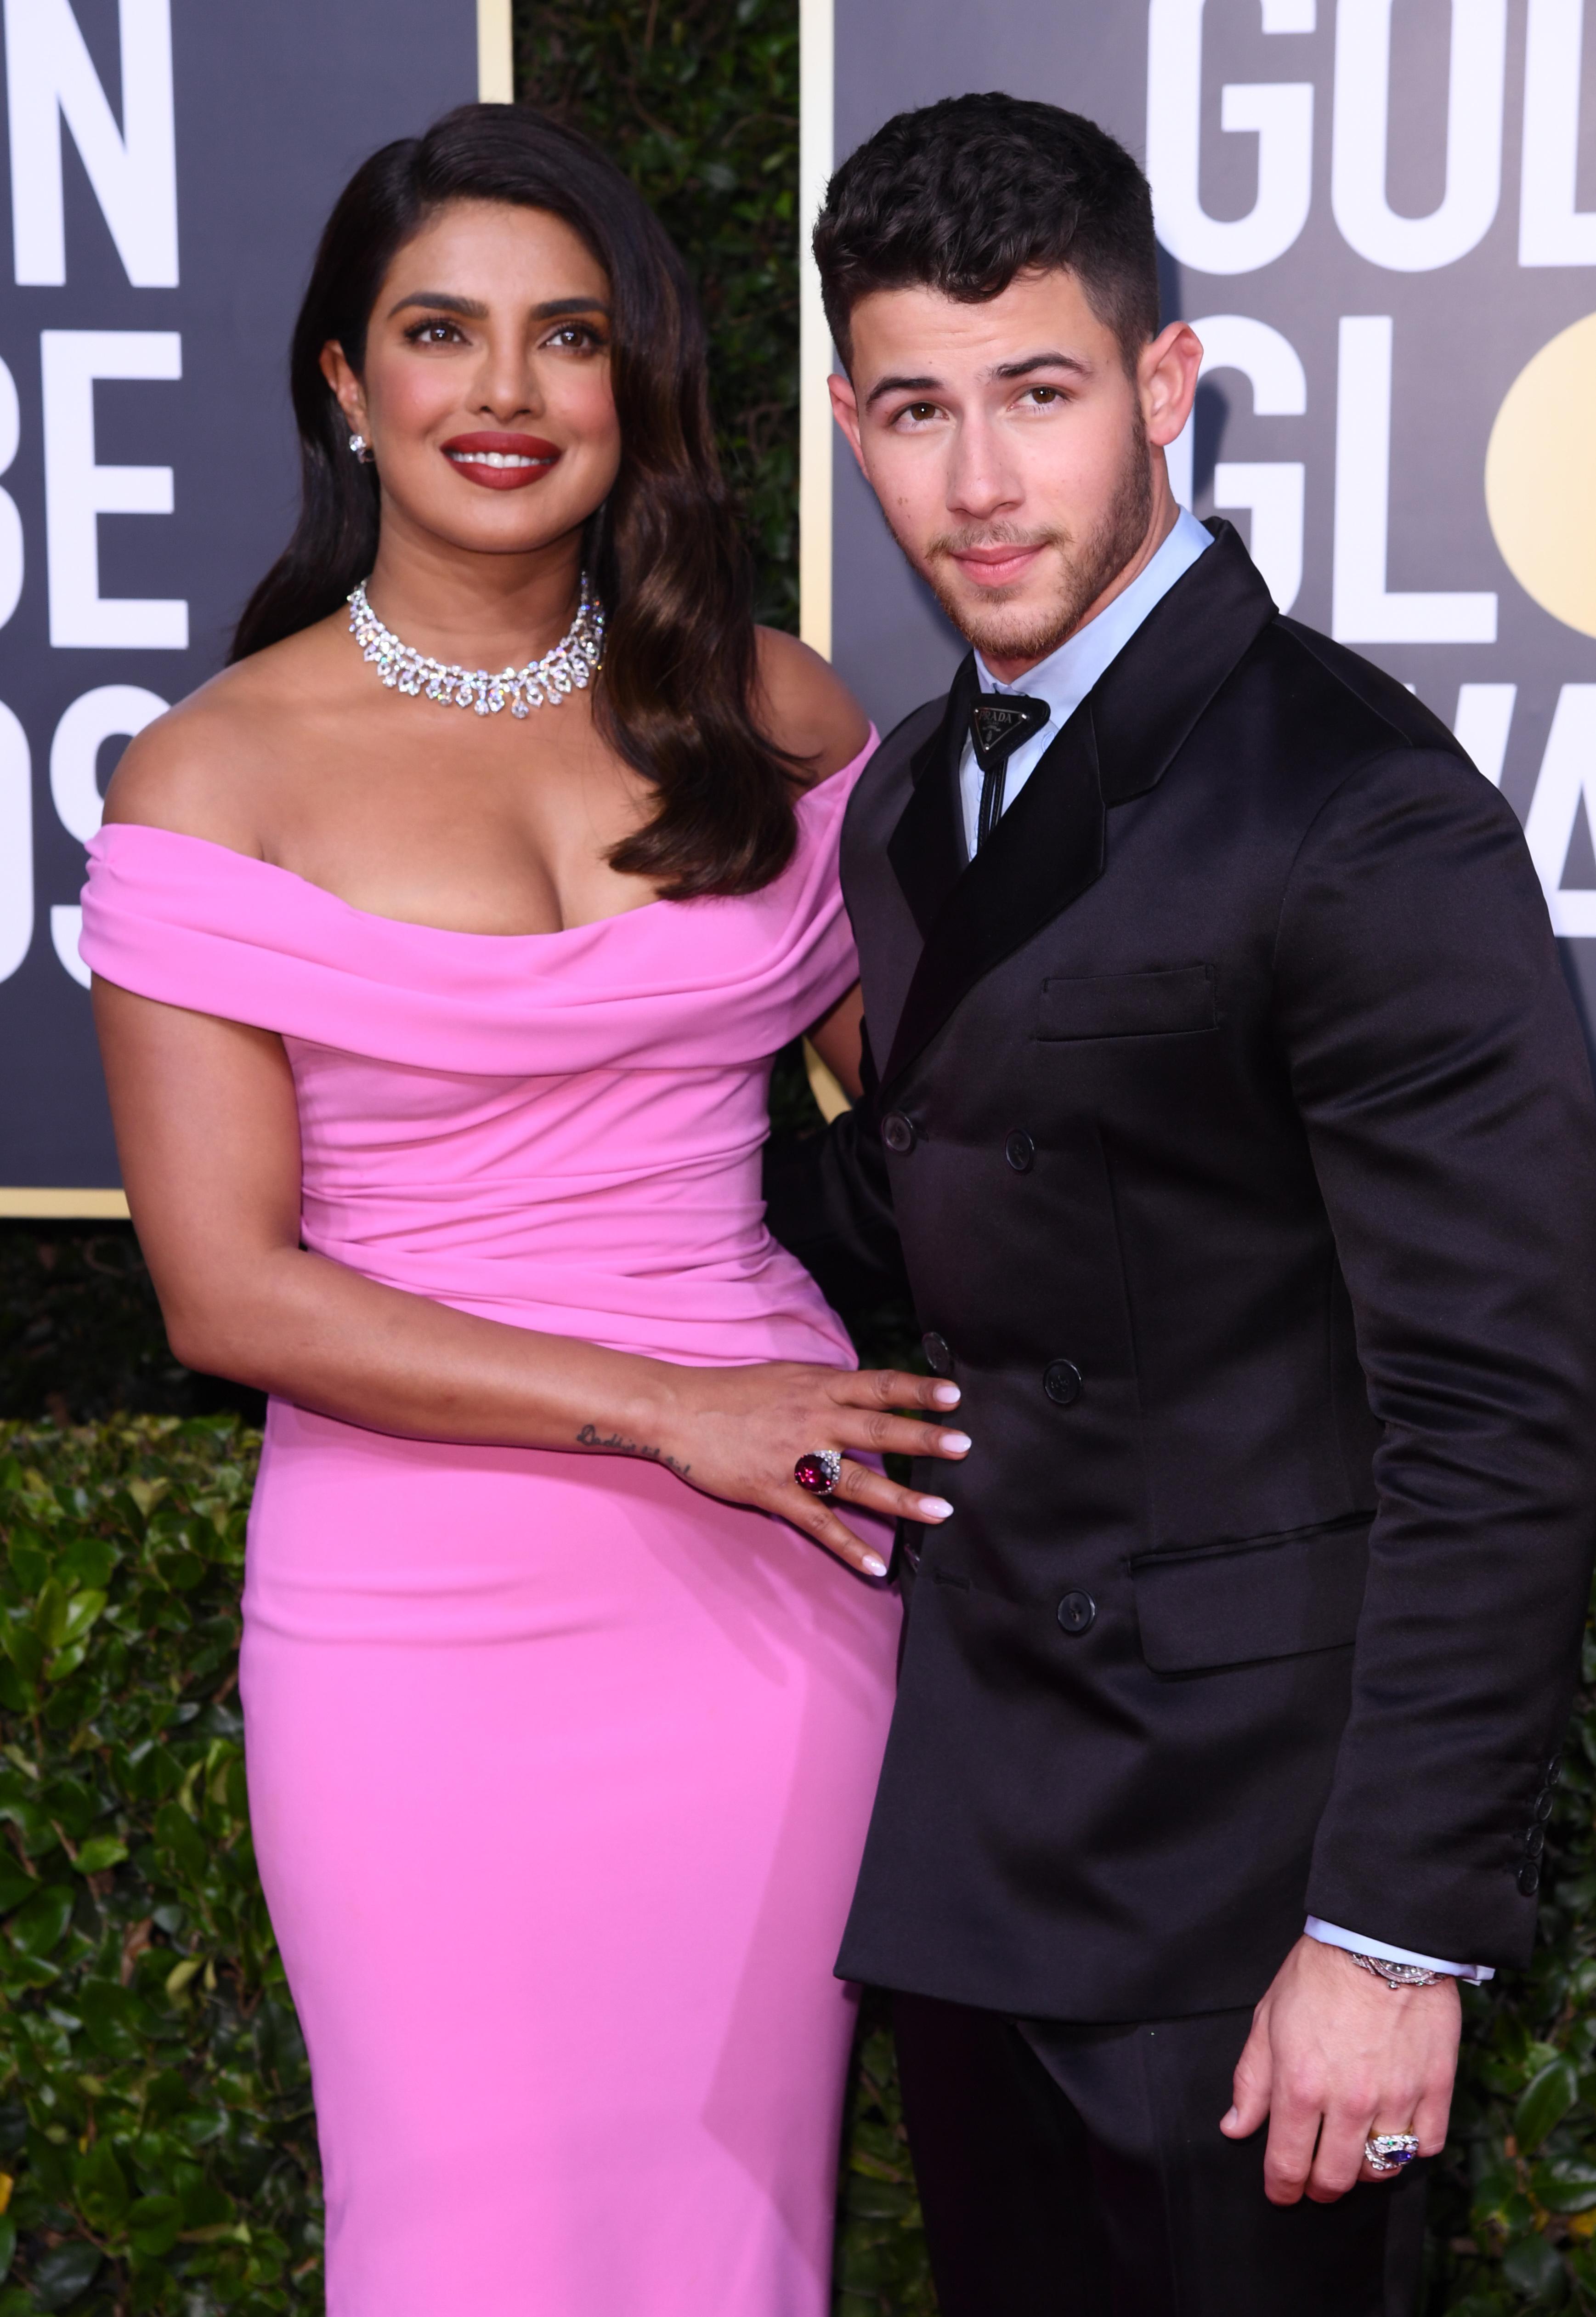 Priyanka Chopra and Nick Jonas77th Annual Golden Globe Awards, Arrivals, Los Angeles, USA - 05 Jan 2020